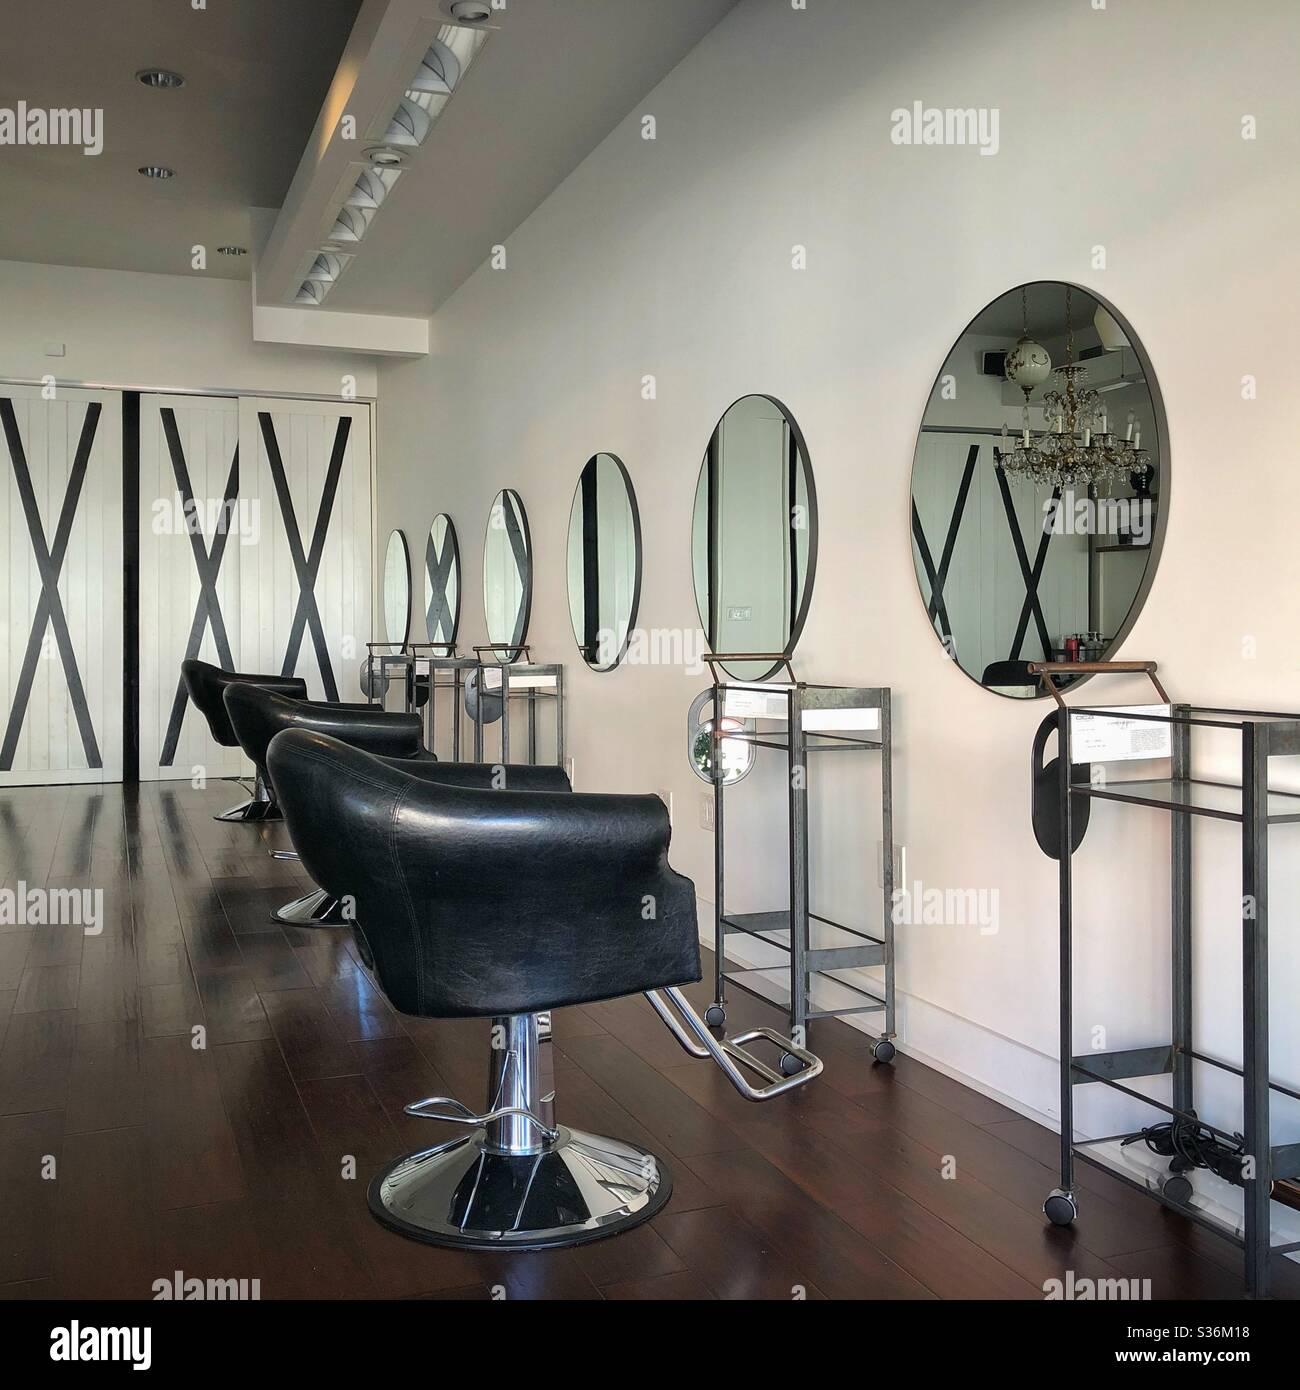 Empty hair salon during Covid shut down in Oakland, California. Stock Photo